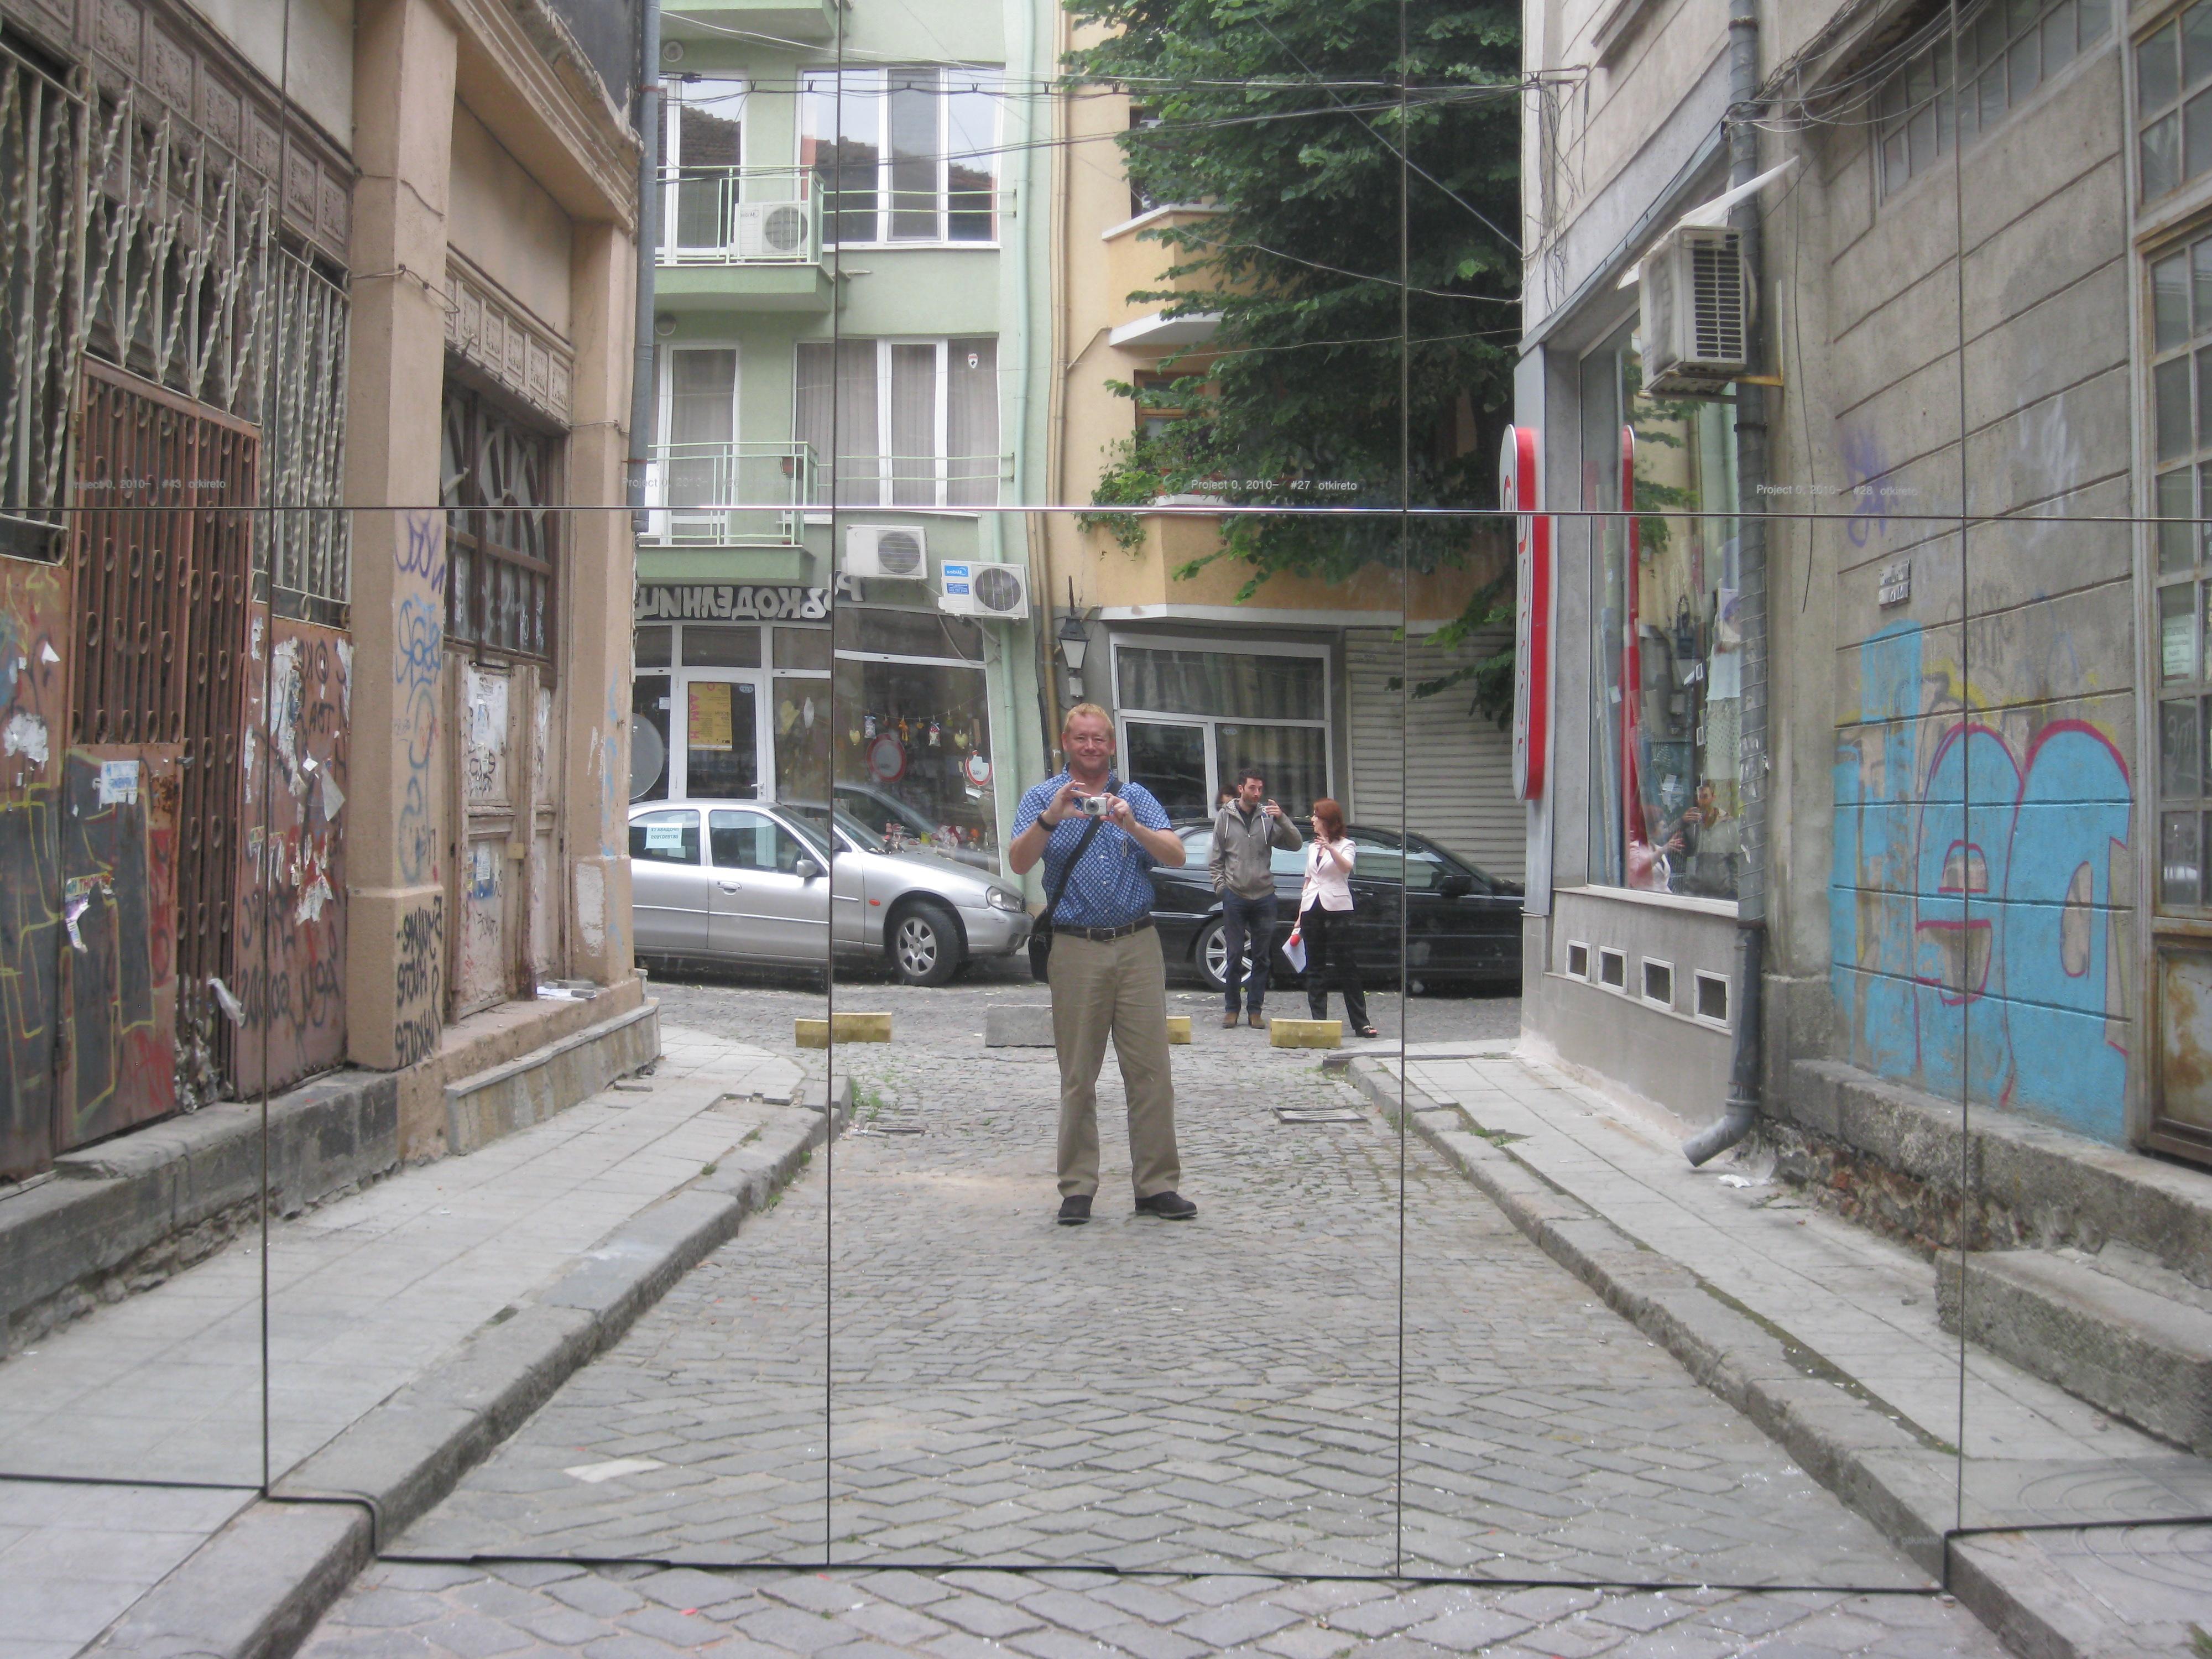 Public art mirror installation for Mirror installation